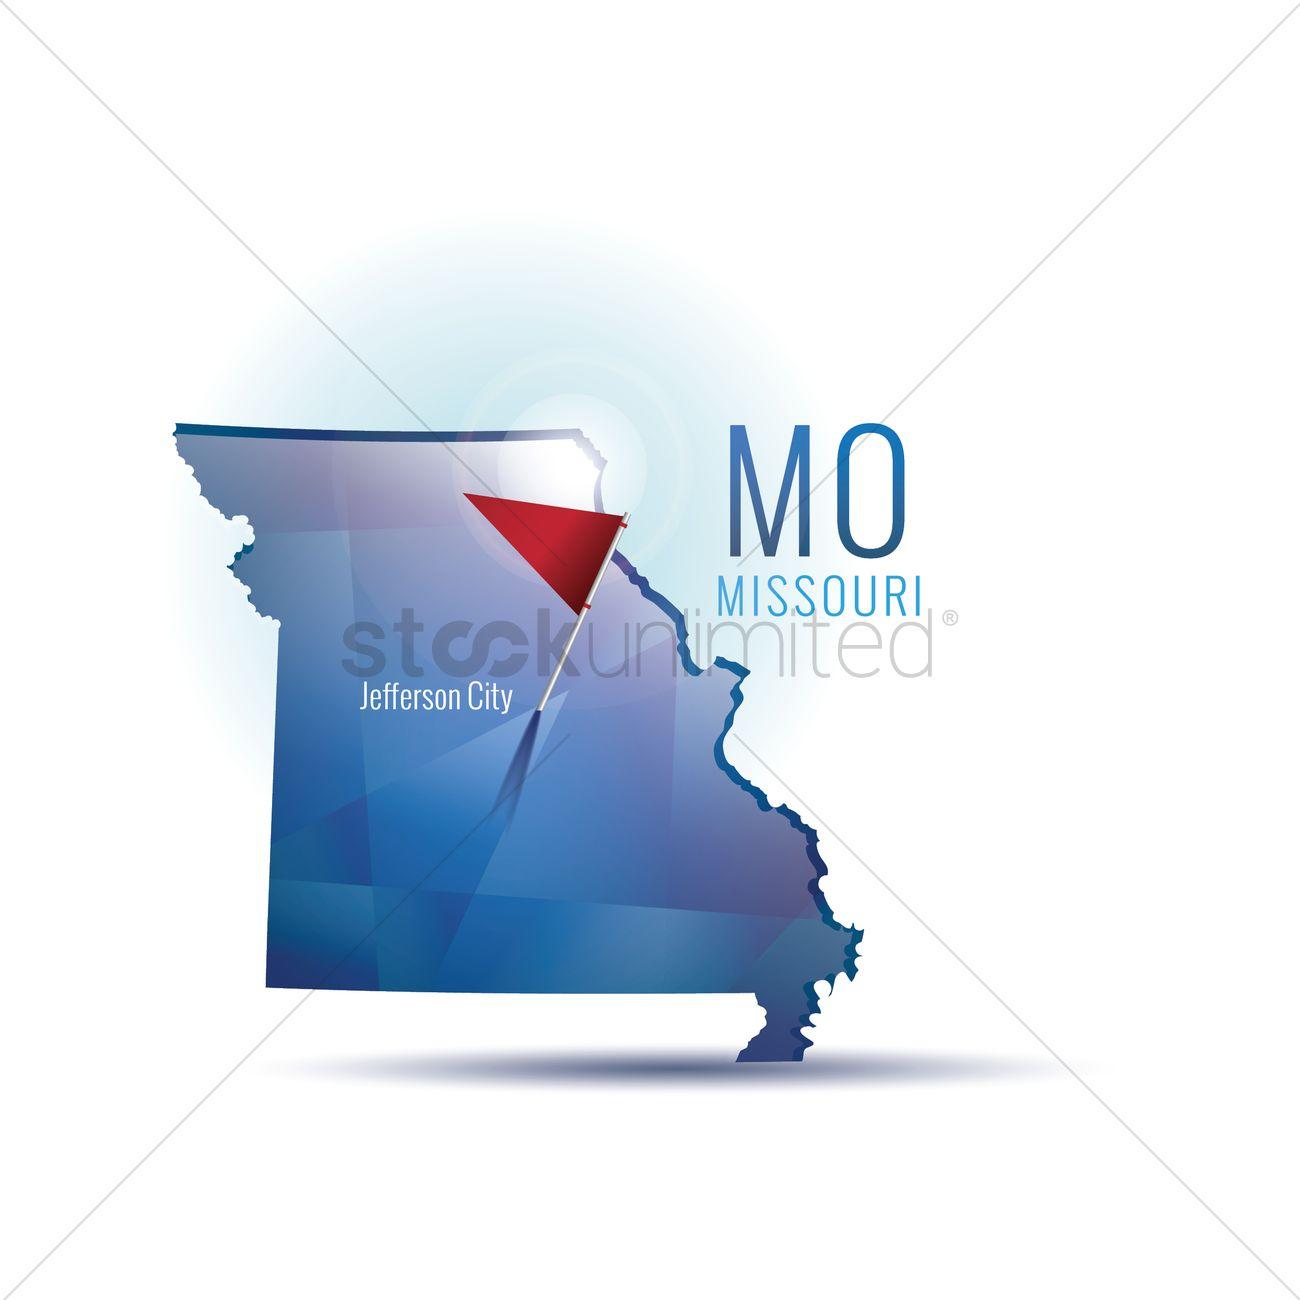 Map Of Capitol Jefferson City Mo on map of linn creek mo, map of rock port mo, map of linn county mo, map of dunklin county mo, map of bellefontaine neighbors mo, map of el dorado springs mo, map of mokane mo, map of edgar springs mo, map of oak ridge mo, map of sturgeon mo, map of jefferson county mo, map of spanish lake mo, map of kirbyville mo, map of north county mo, map of saline county mo, map of des peres mo, map of missouri, map of irondale mo, map of greentop mo,